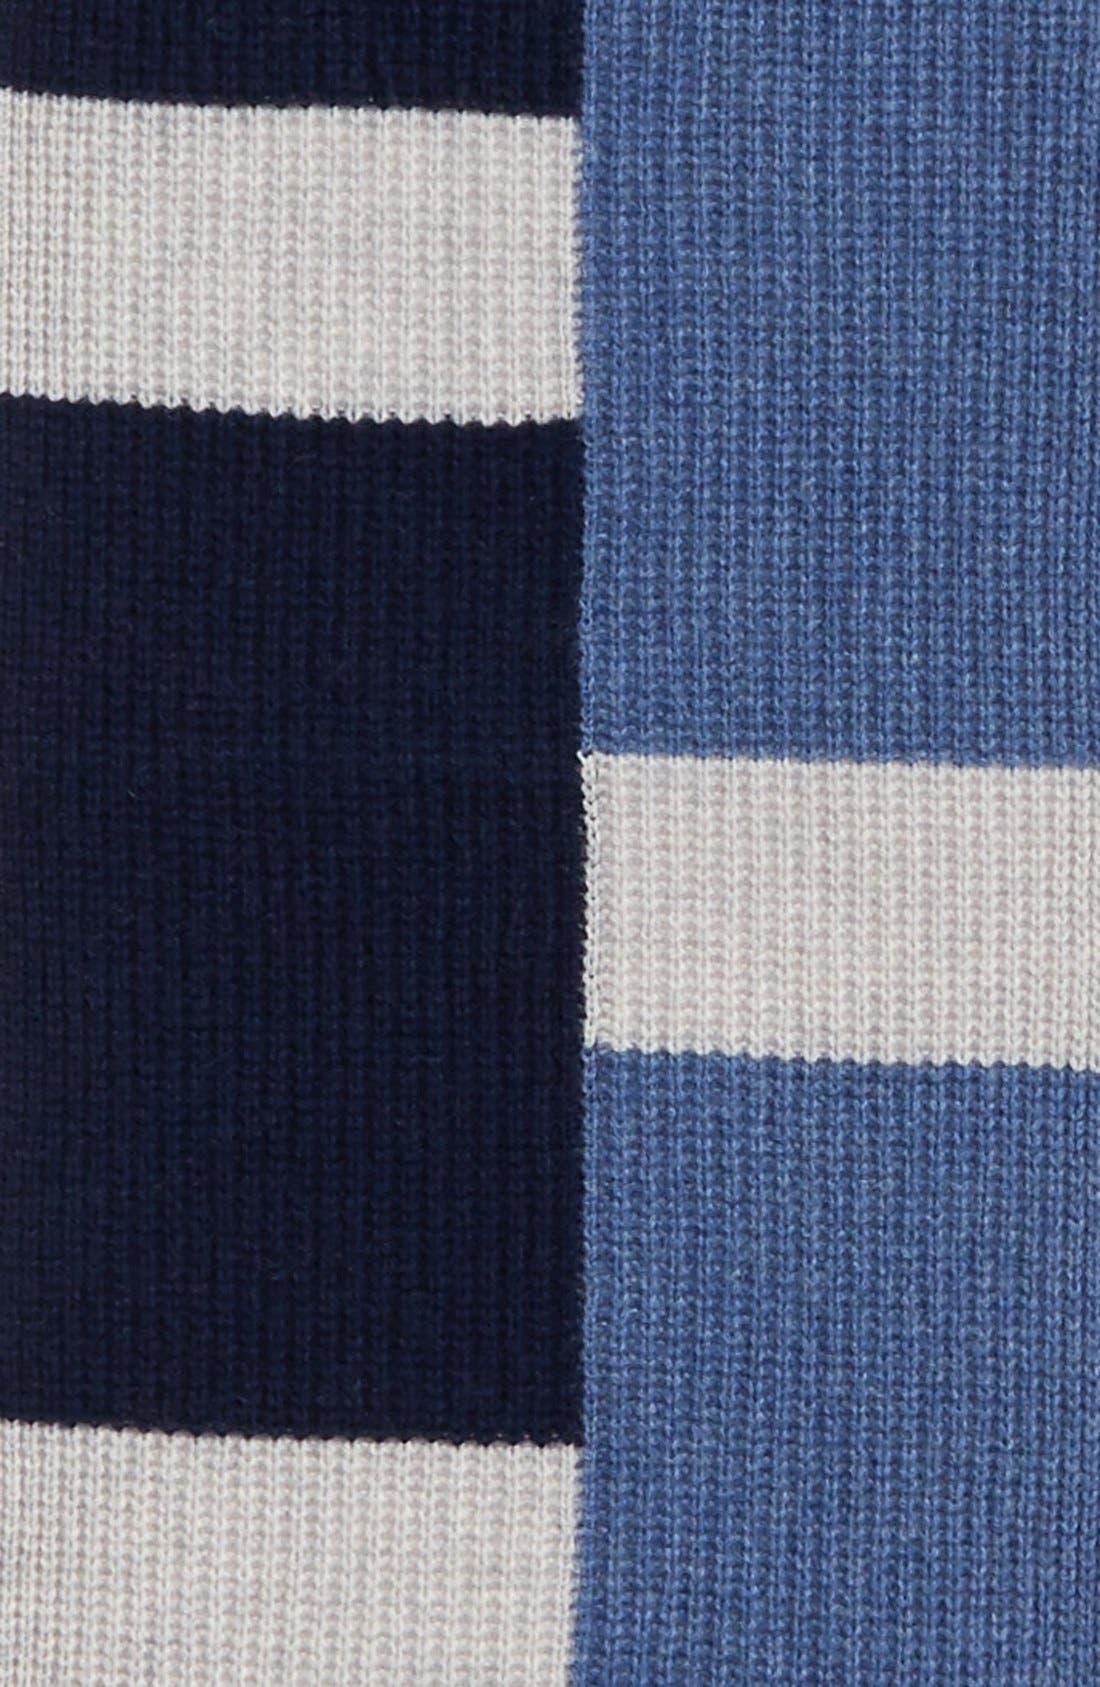 Alternate Image 3  - Halogen® Colorblock Knit Cashmere Scarf